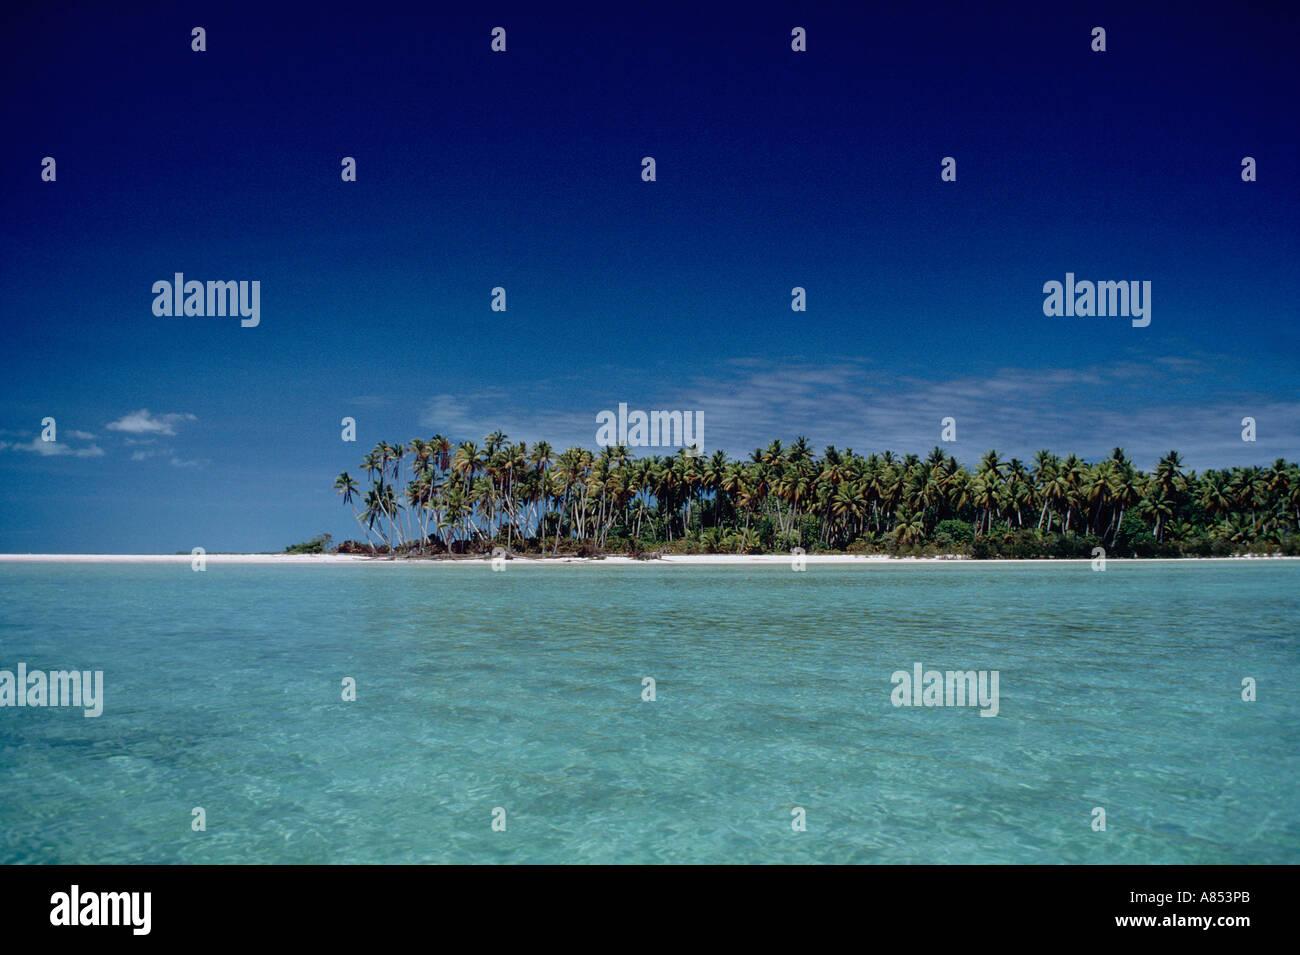 Kiribati. Tarawa. Tropical beach with coconut palm trees. Stock Photo